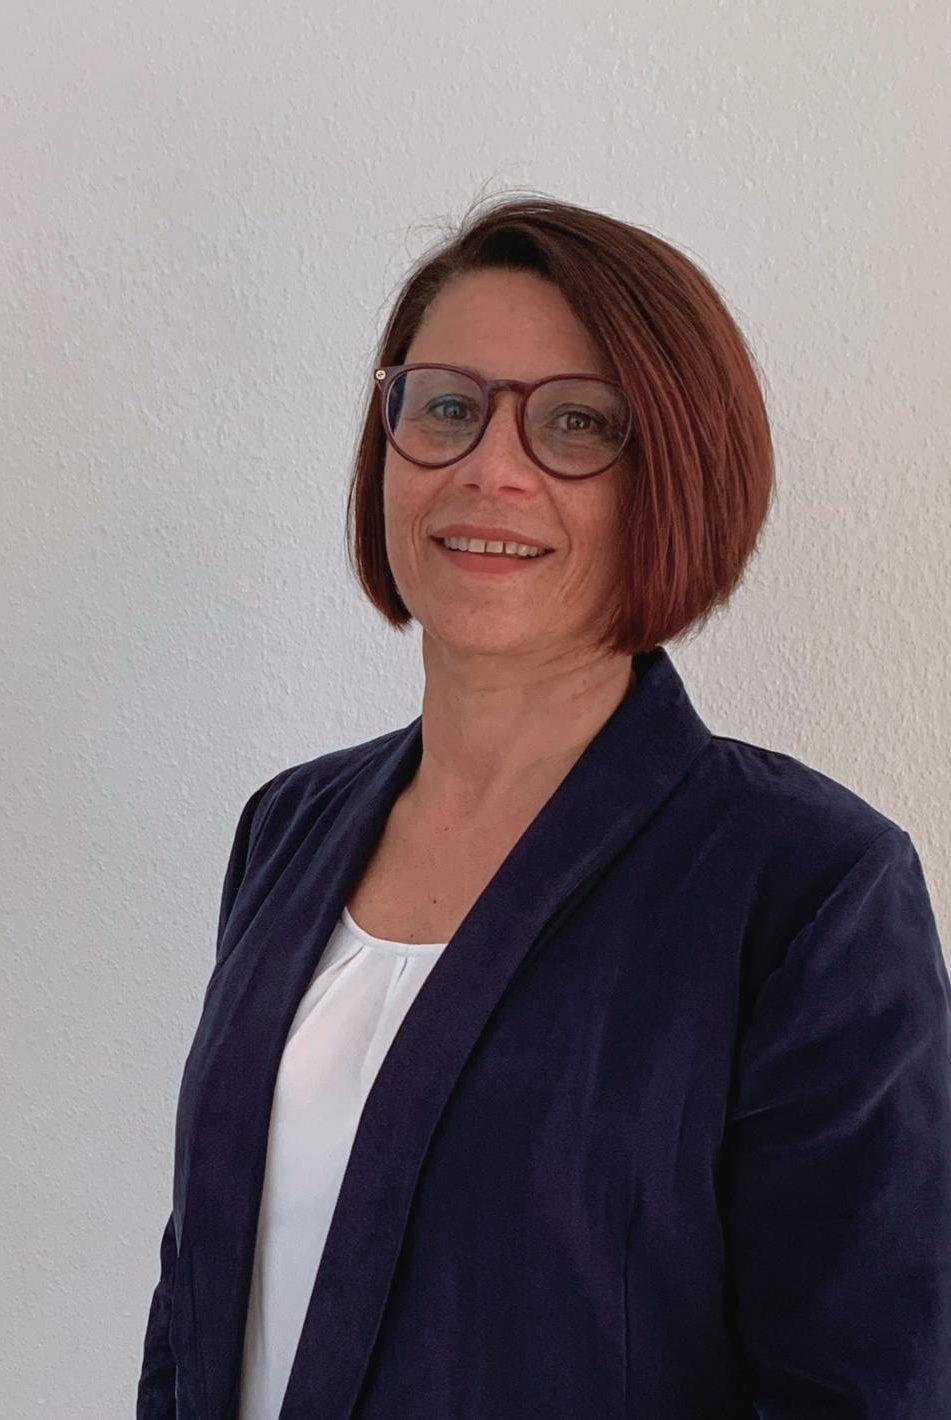 Sandrine klein